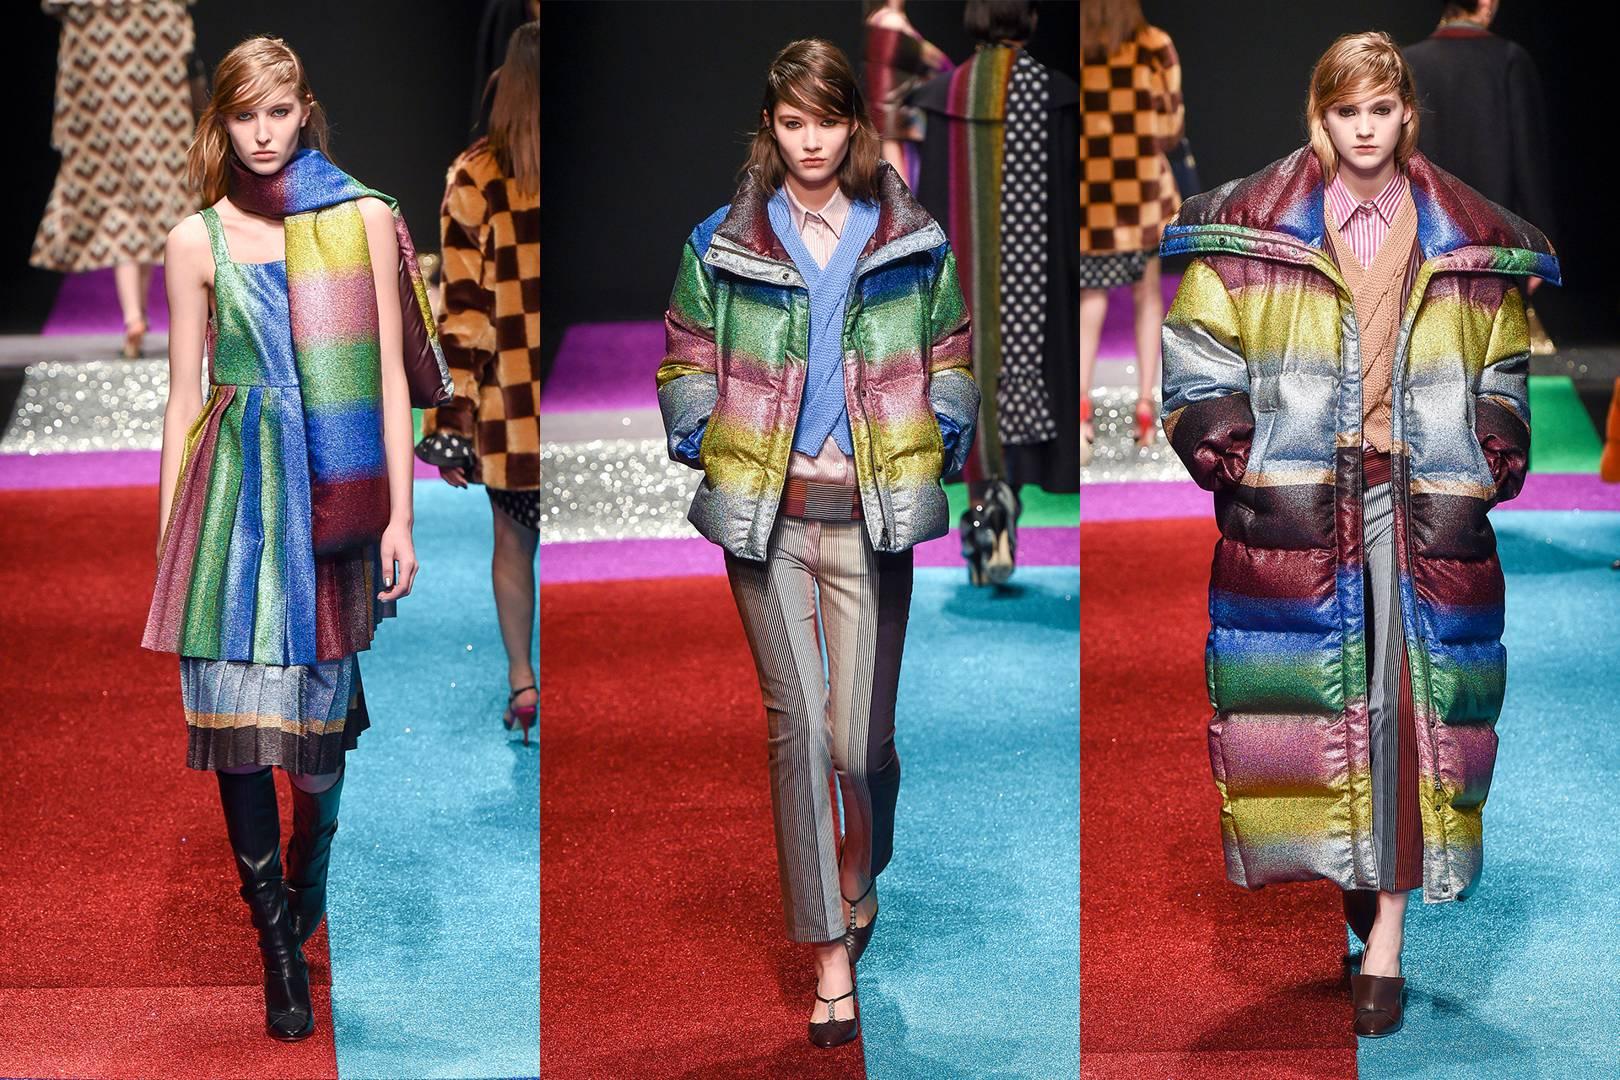 dac111b05c How The Rainbow Flag Found Its Way Onto The Catwalk | British Vogue